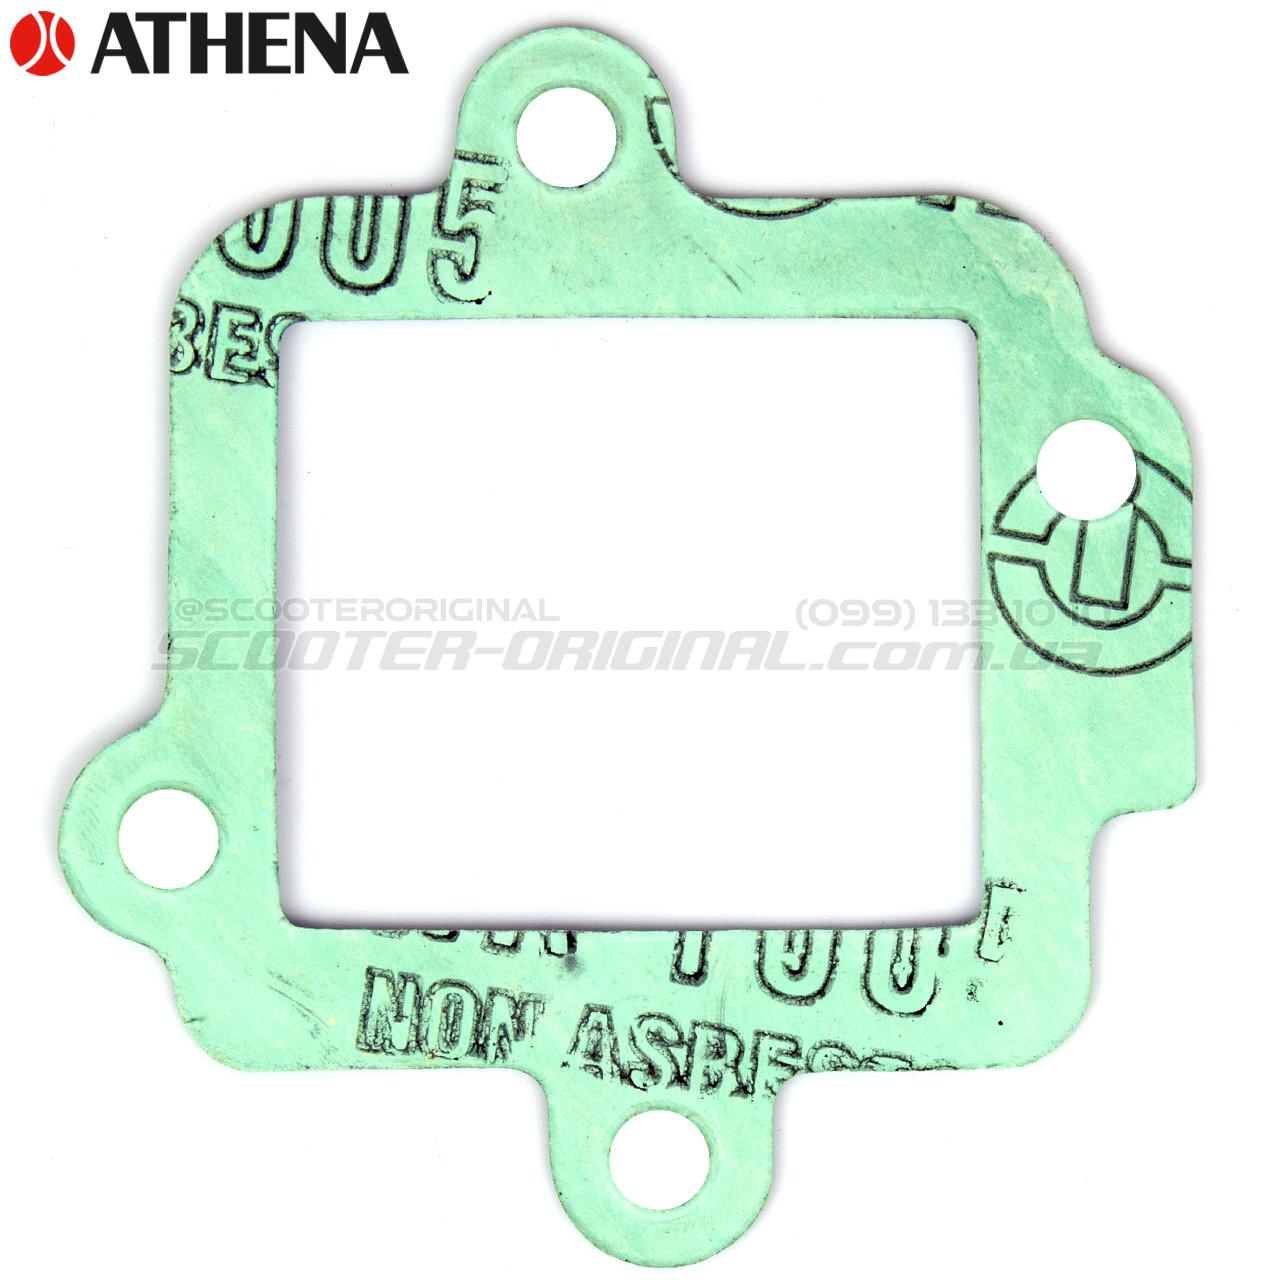 Прокладка лепесткового клапана ATHENA Minarelli Horizontal (Yamaha 5BM / 5SU)